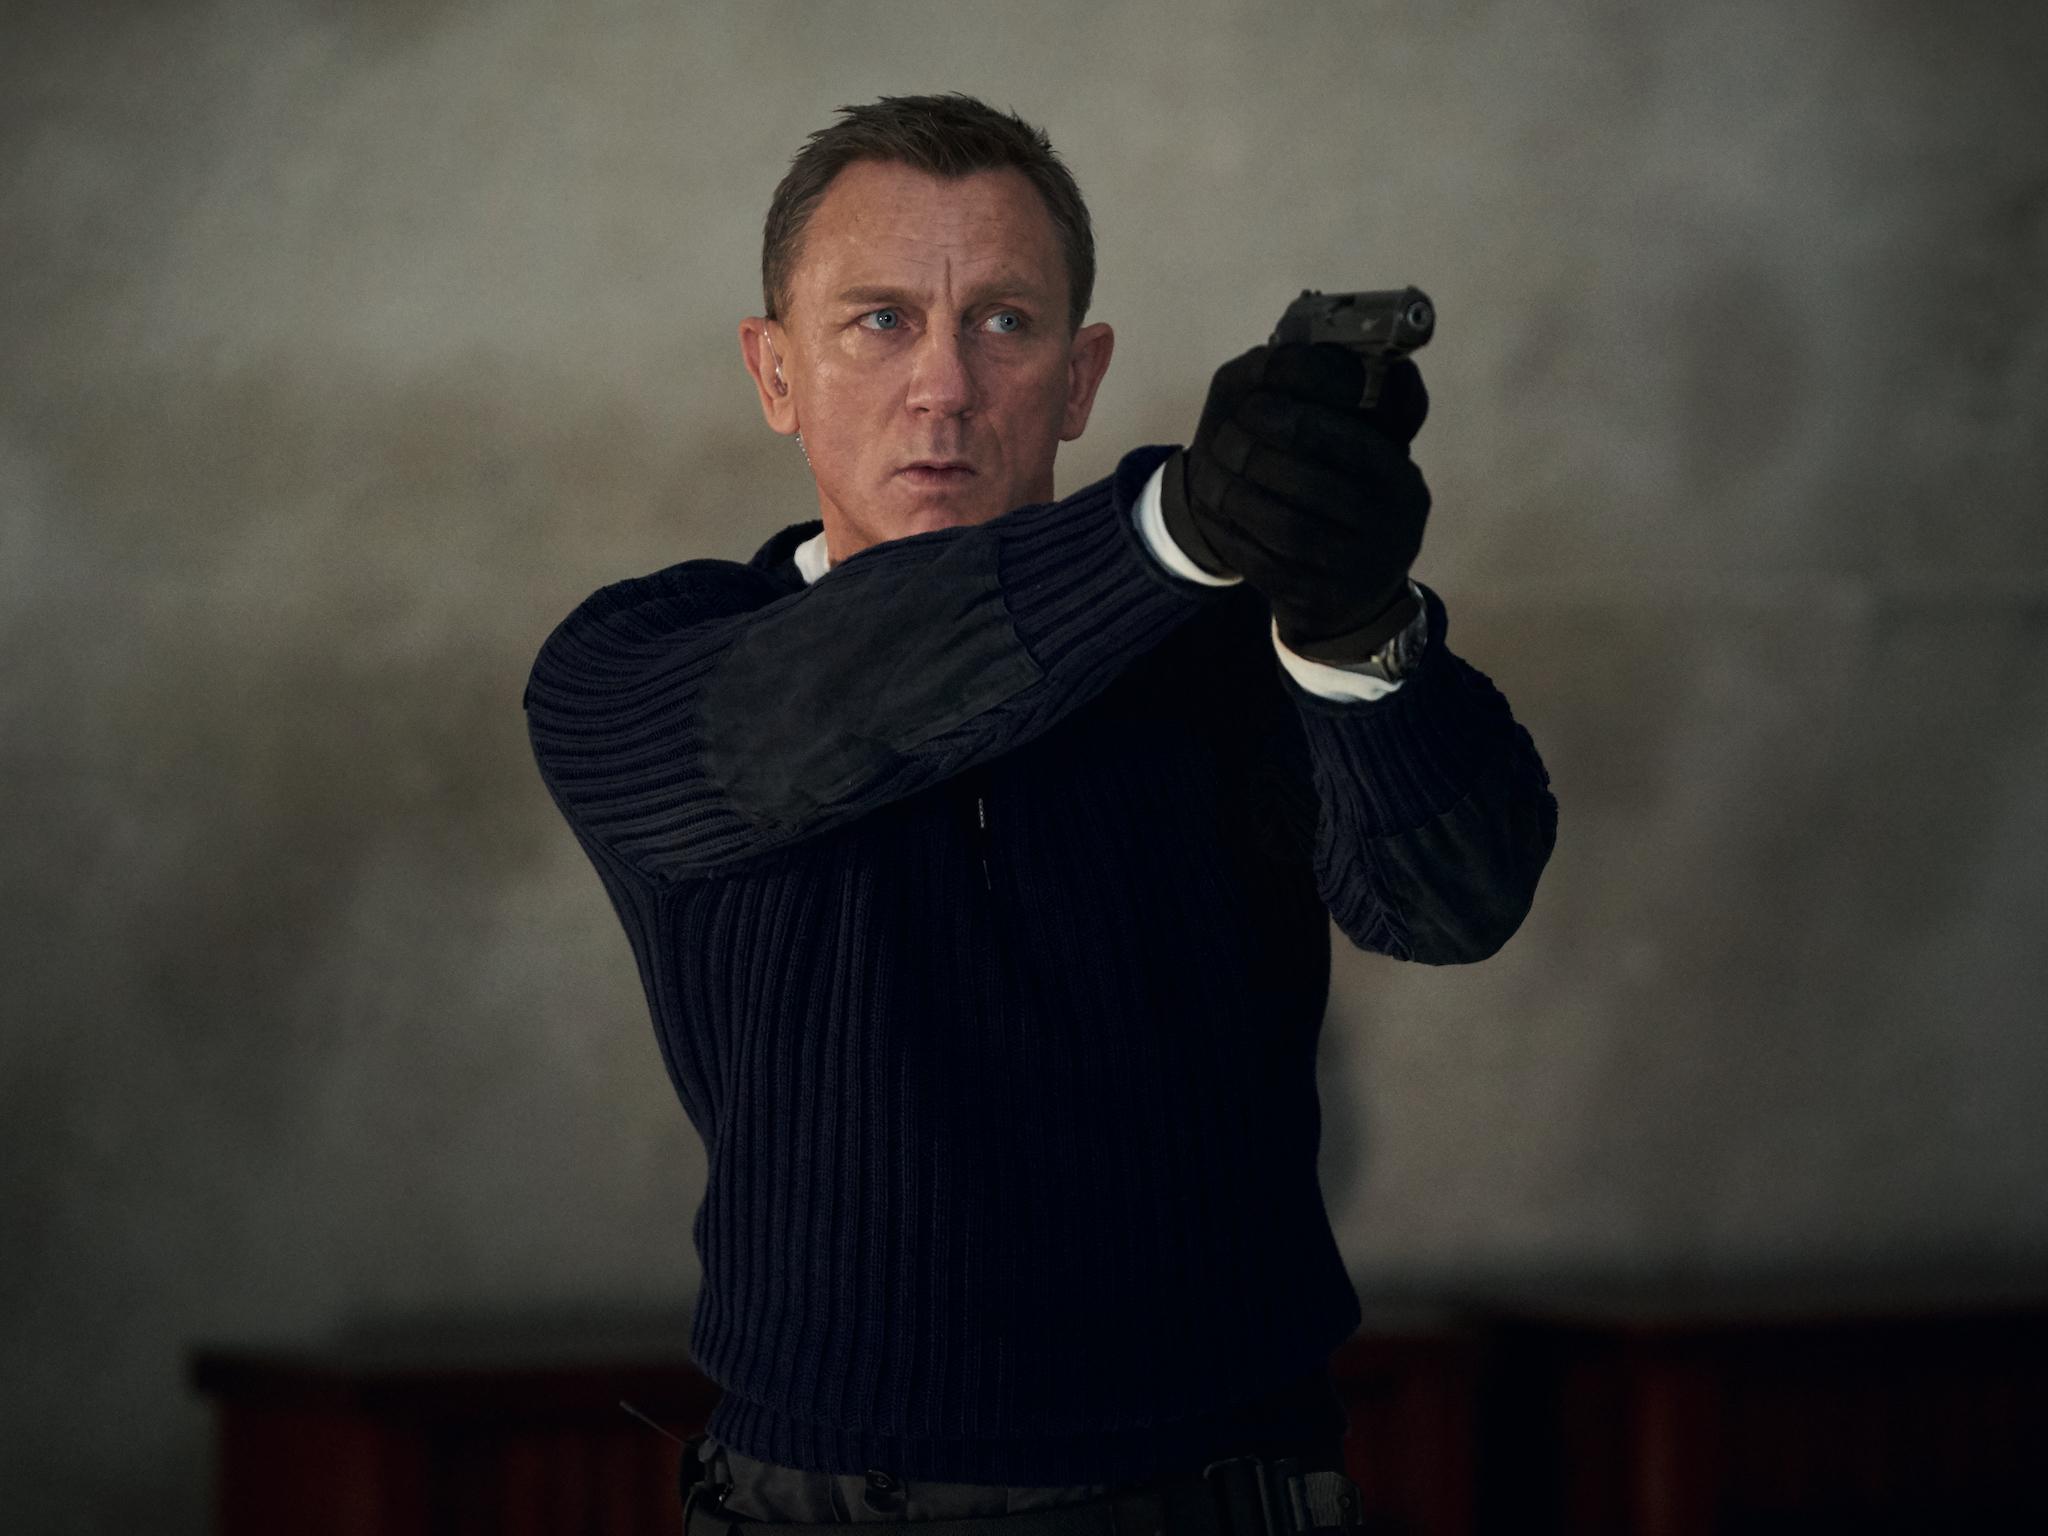 'No Time to Die' is postponed again – and London cinemas respond